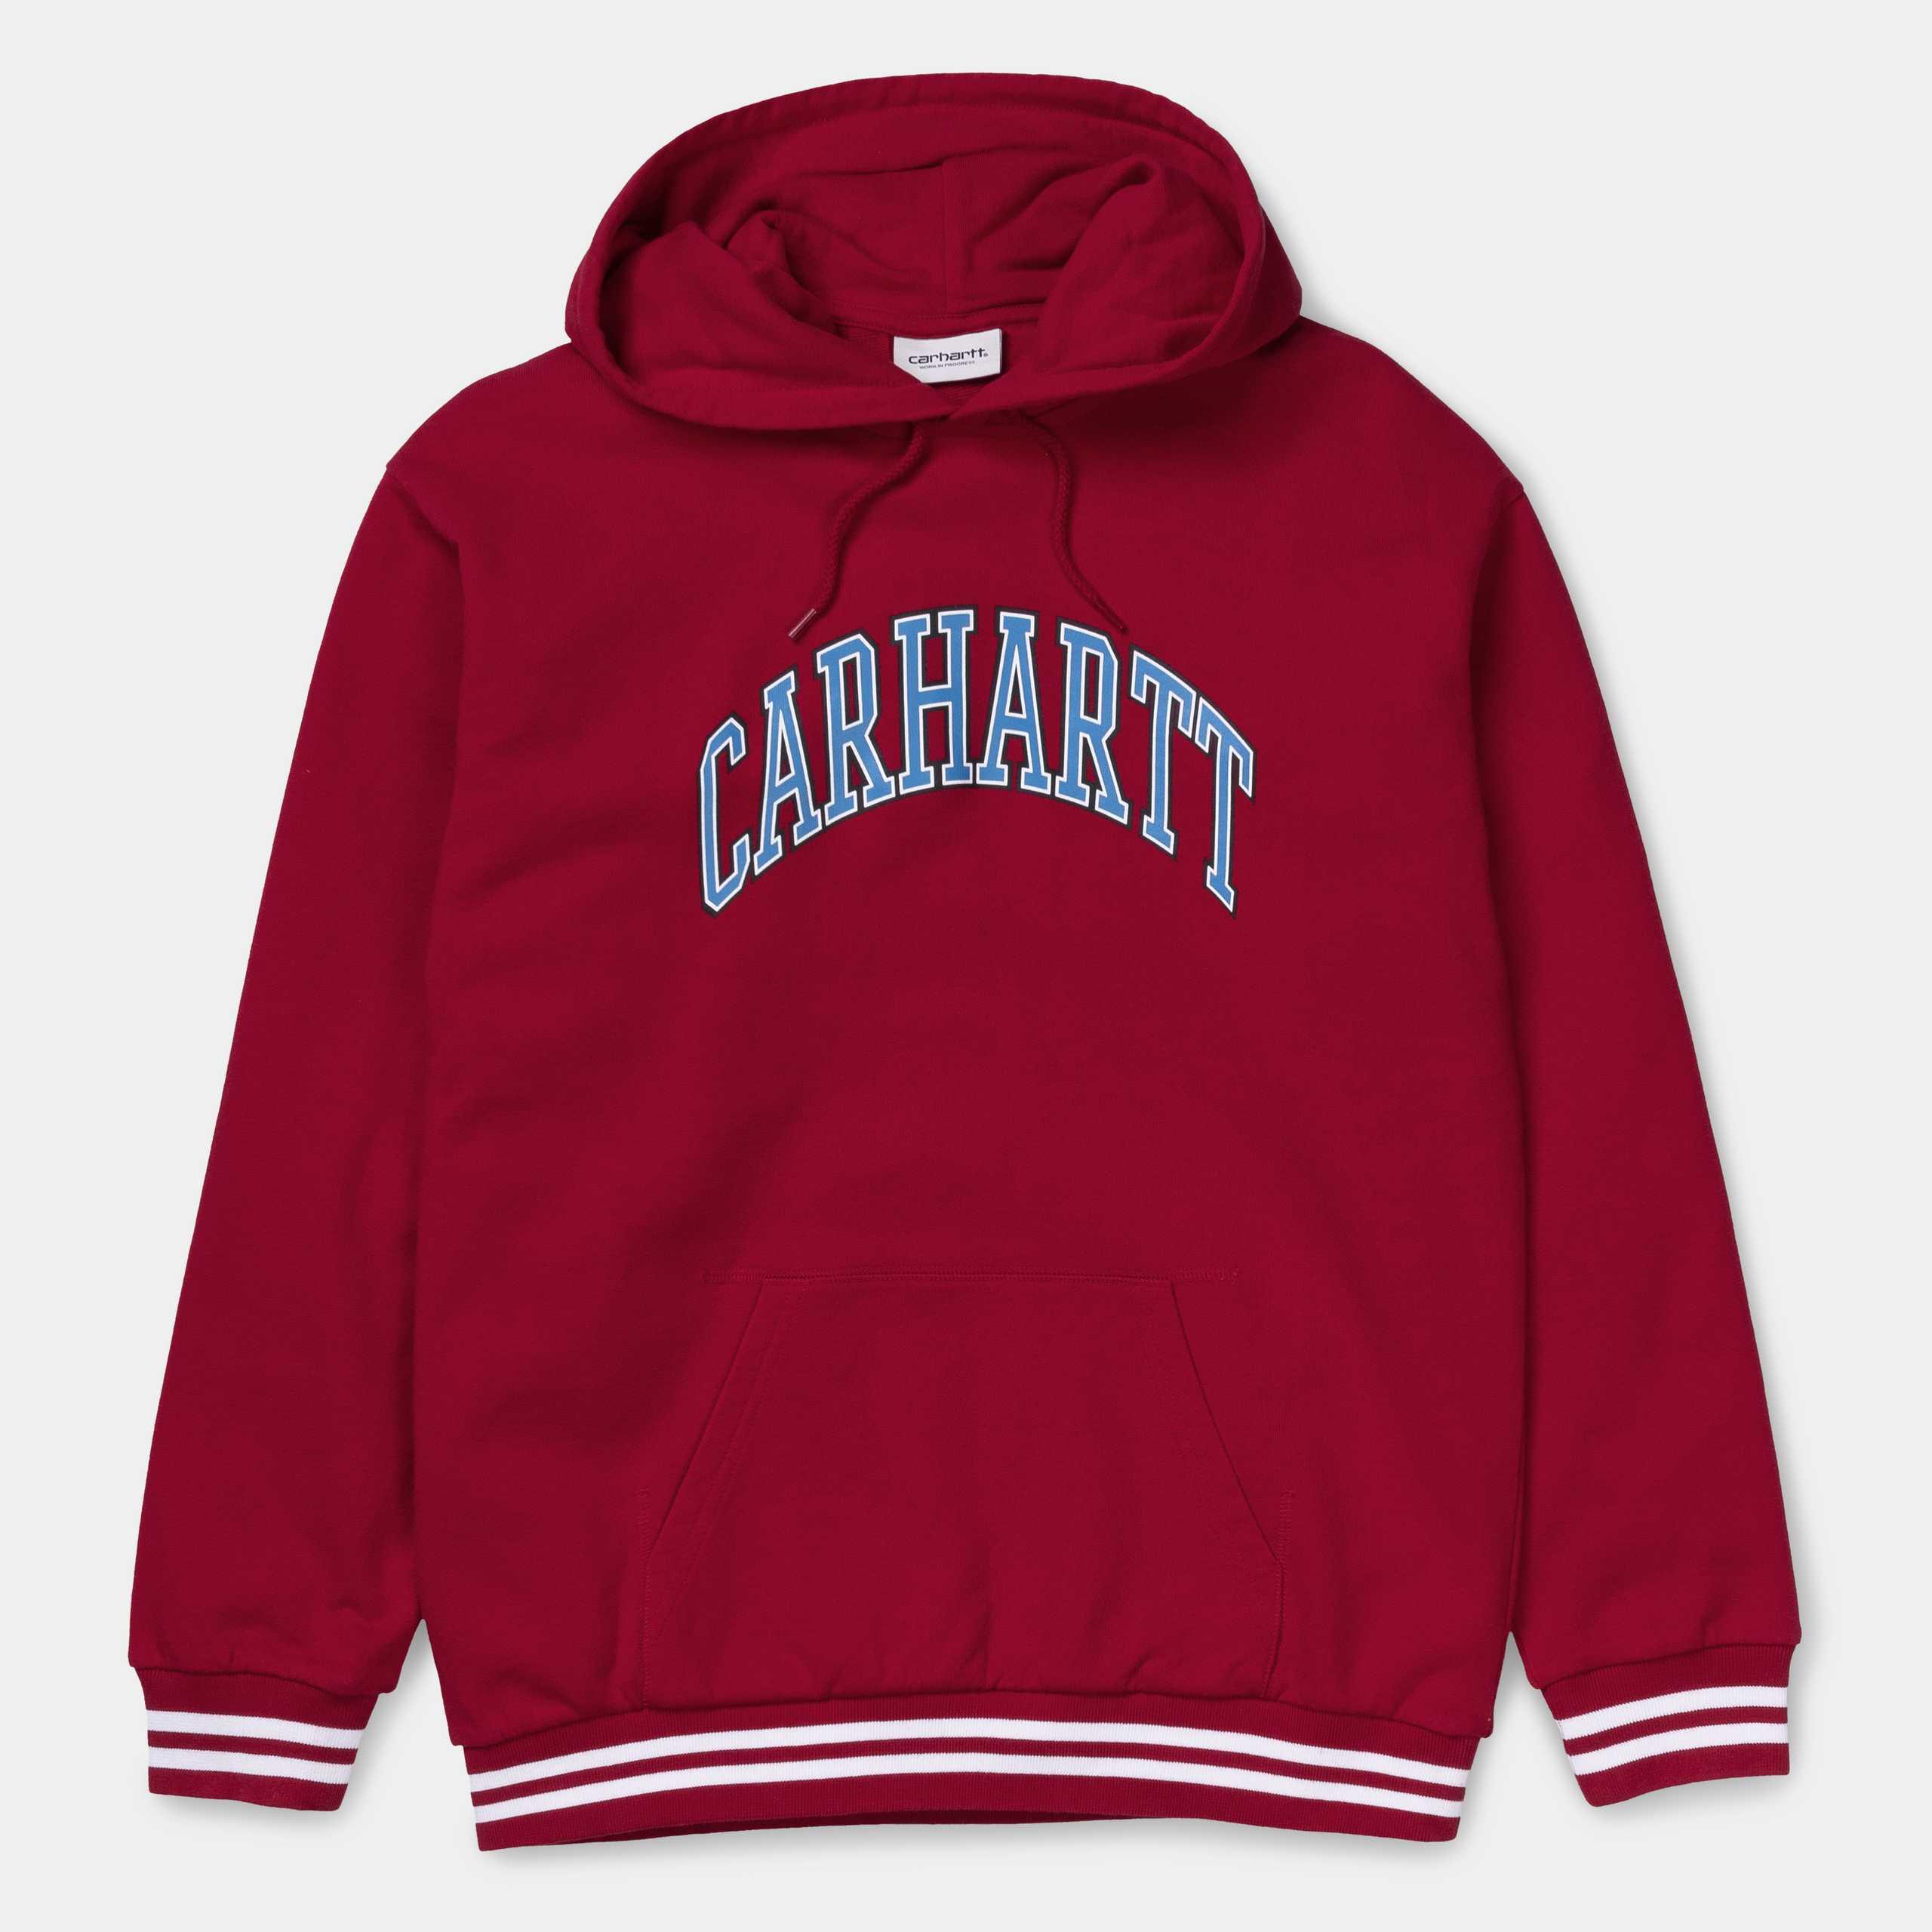 48h lang 20% extra Rabatt auf den kompletten Carhartt-Sale, z.B. W' Hooded Knowledge Sweatshirt